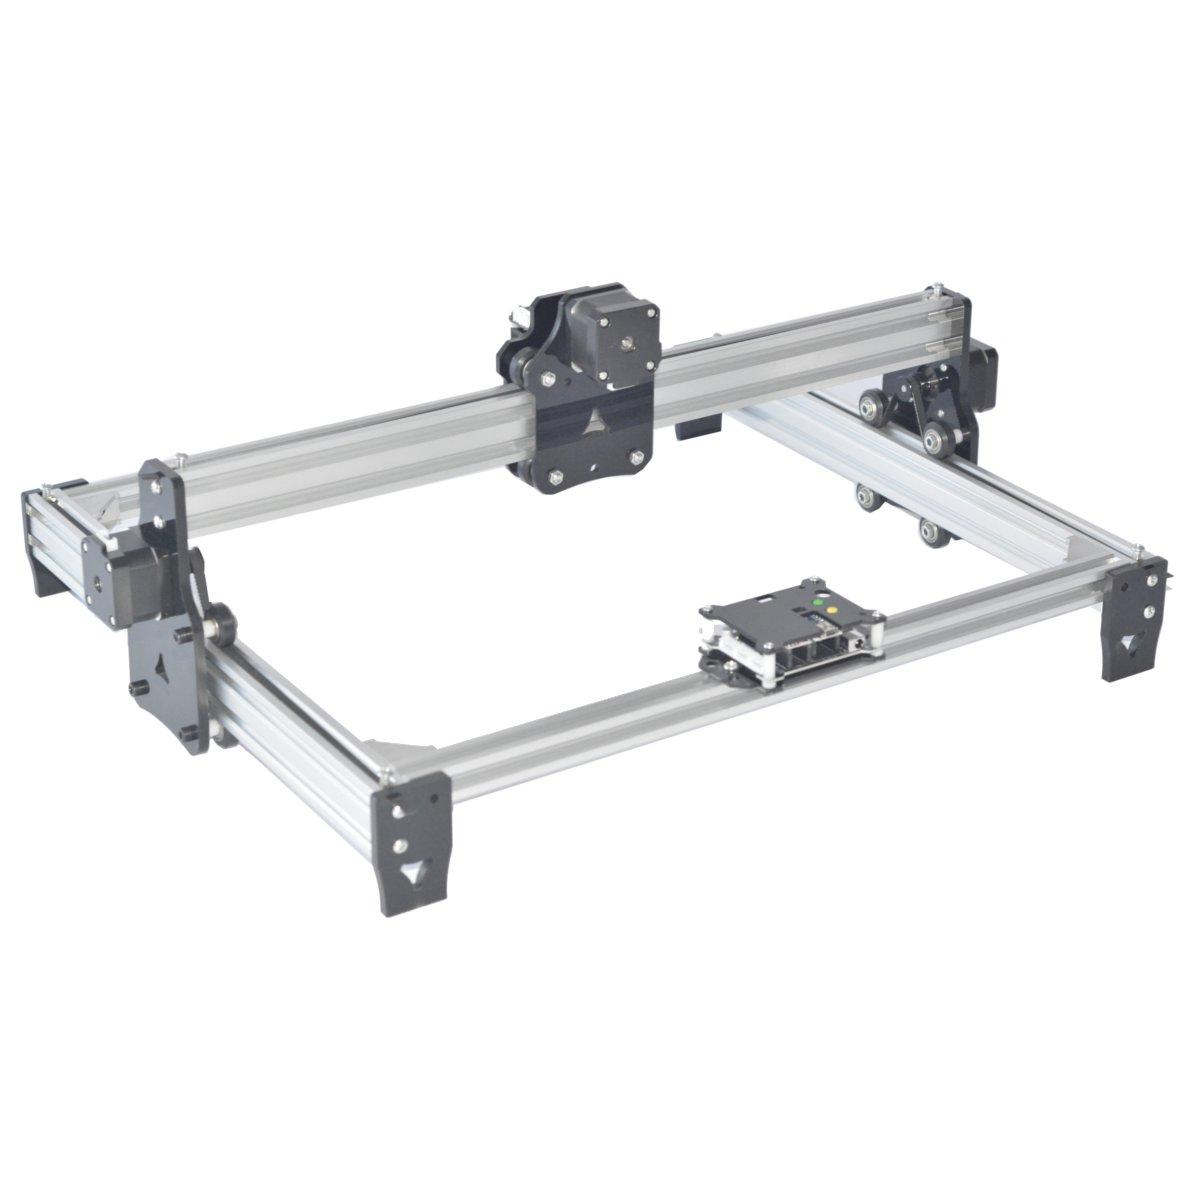 Details about 5500mw A3 Laser Engraving Cutting Machine Engraver Printer  CNC Desktop 30x38cm